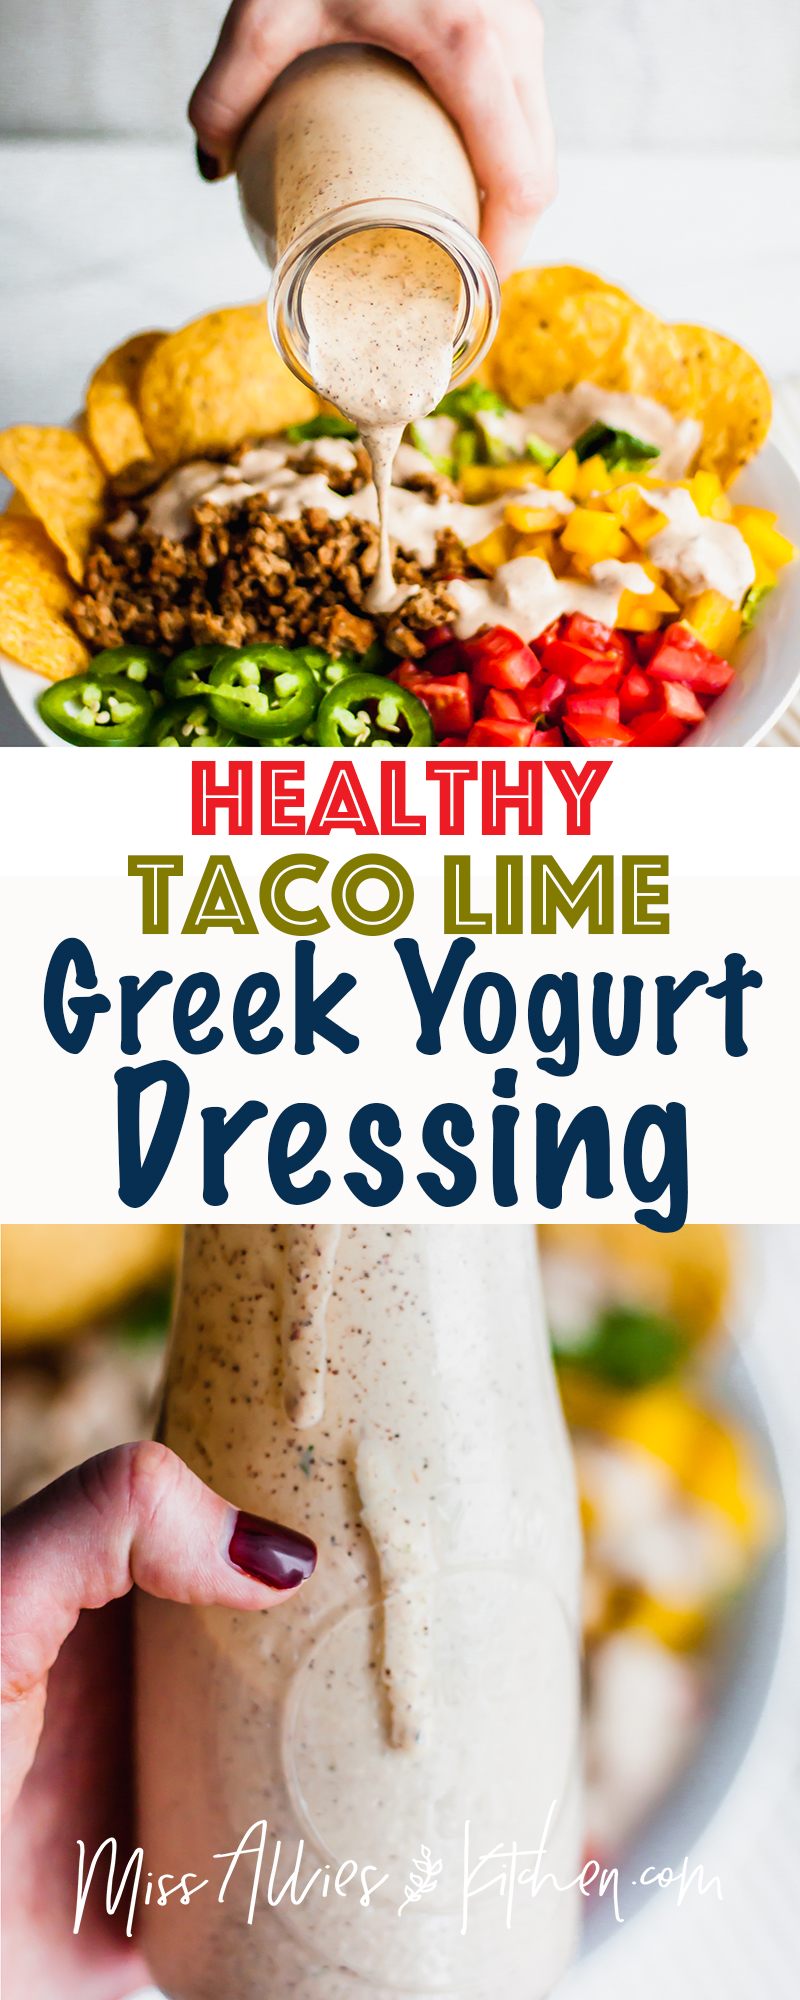 Healthy Taco Lime Greek Yogurt Dressing